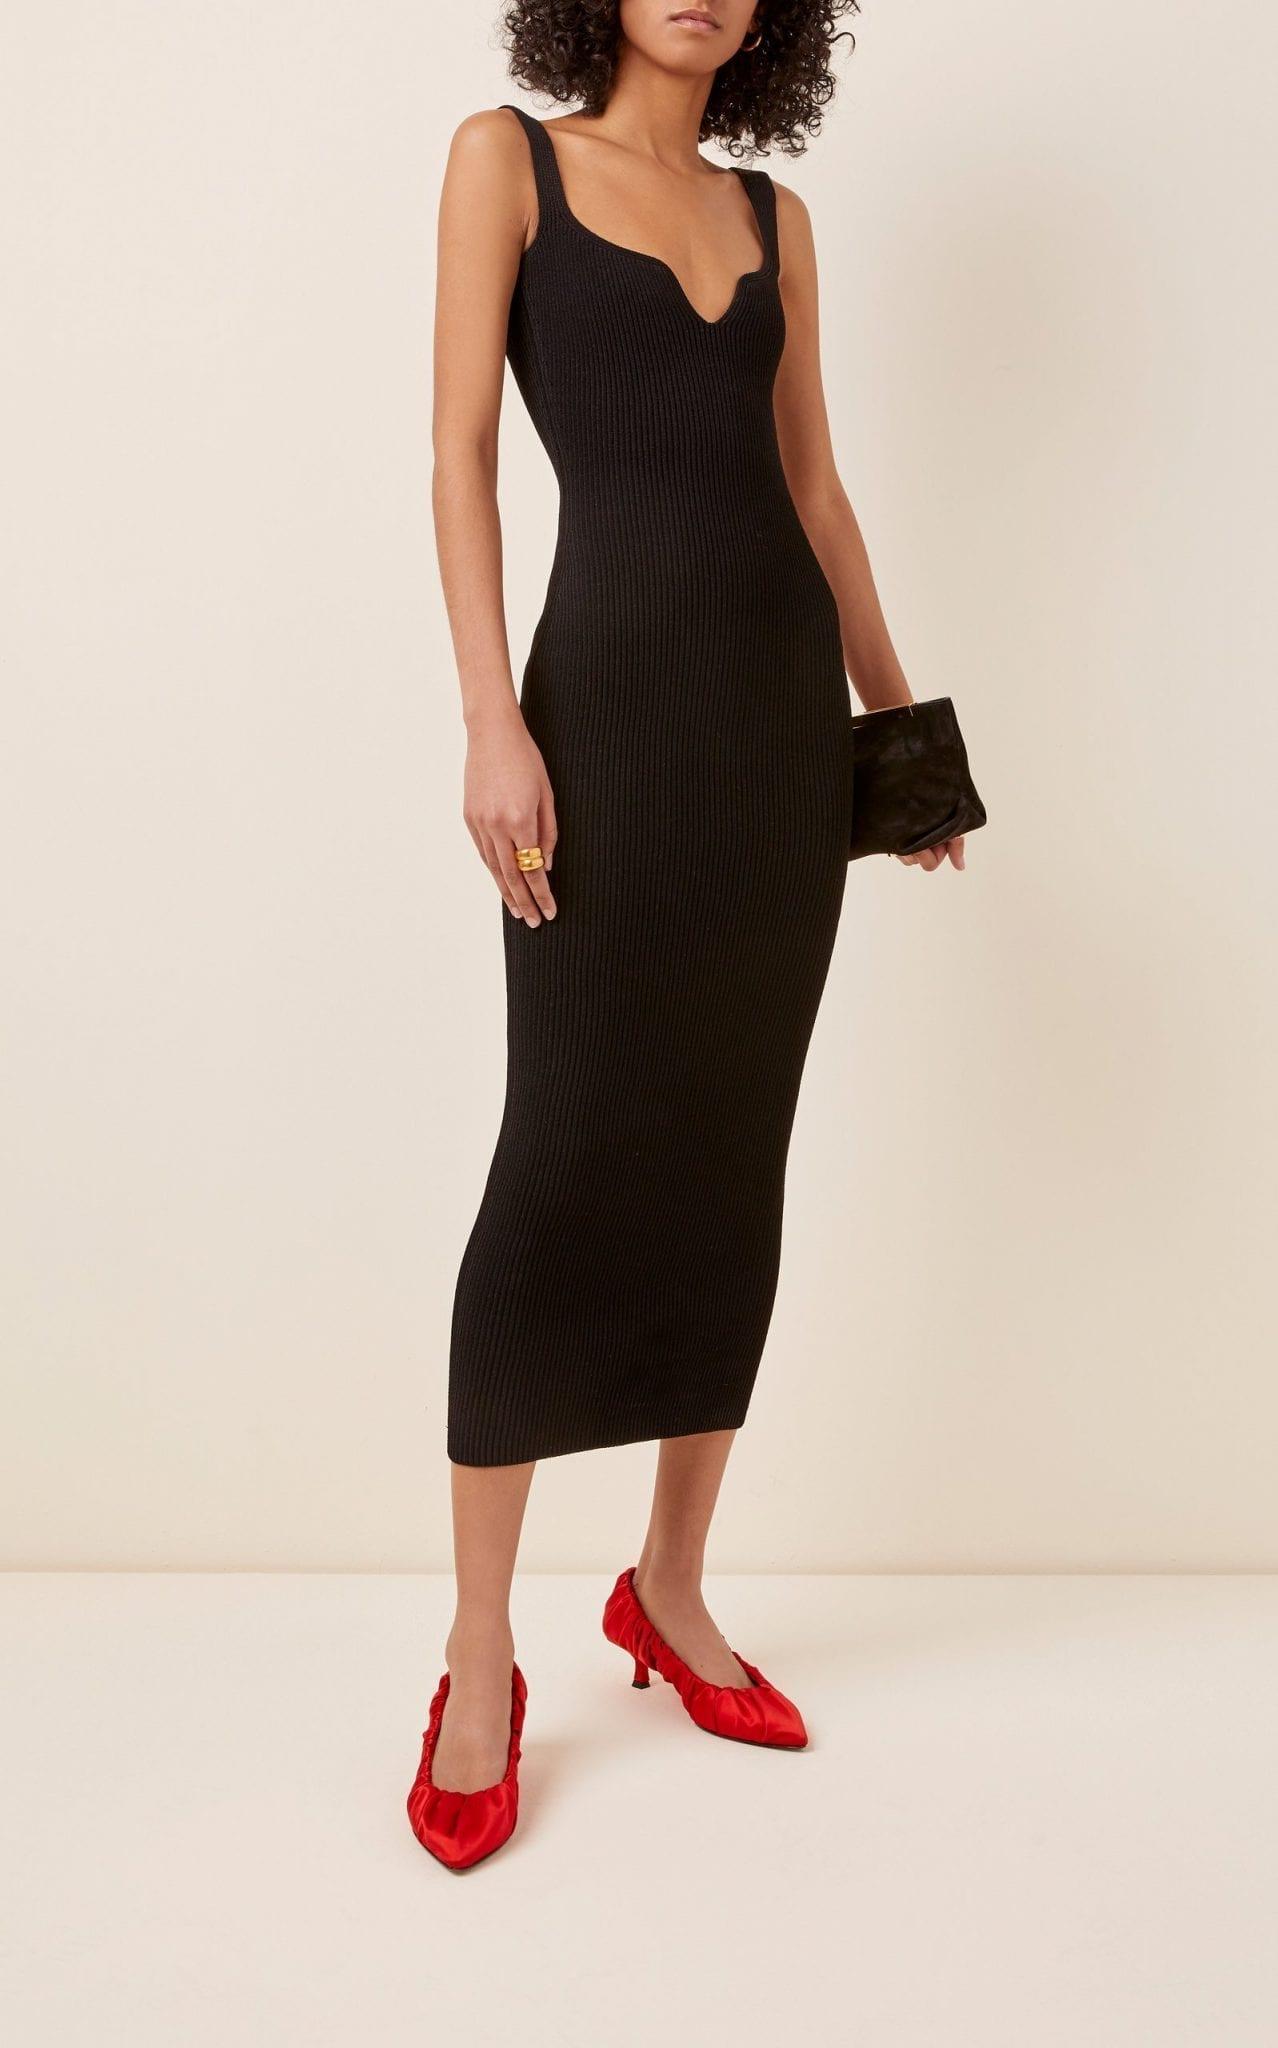 KHAITE Nina Sleeveless Crepe Dress